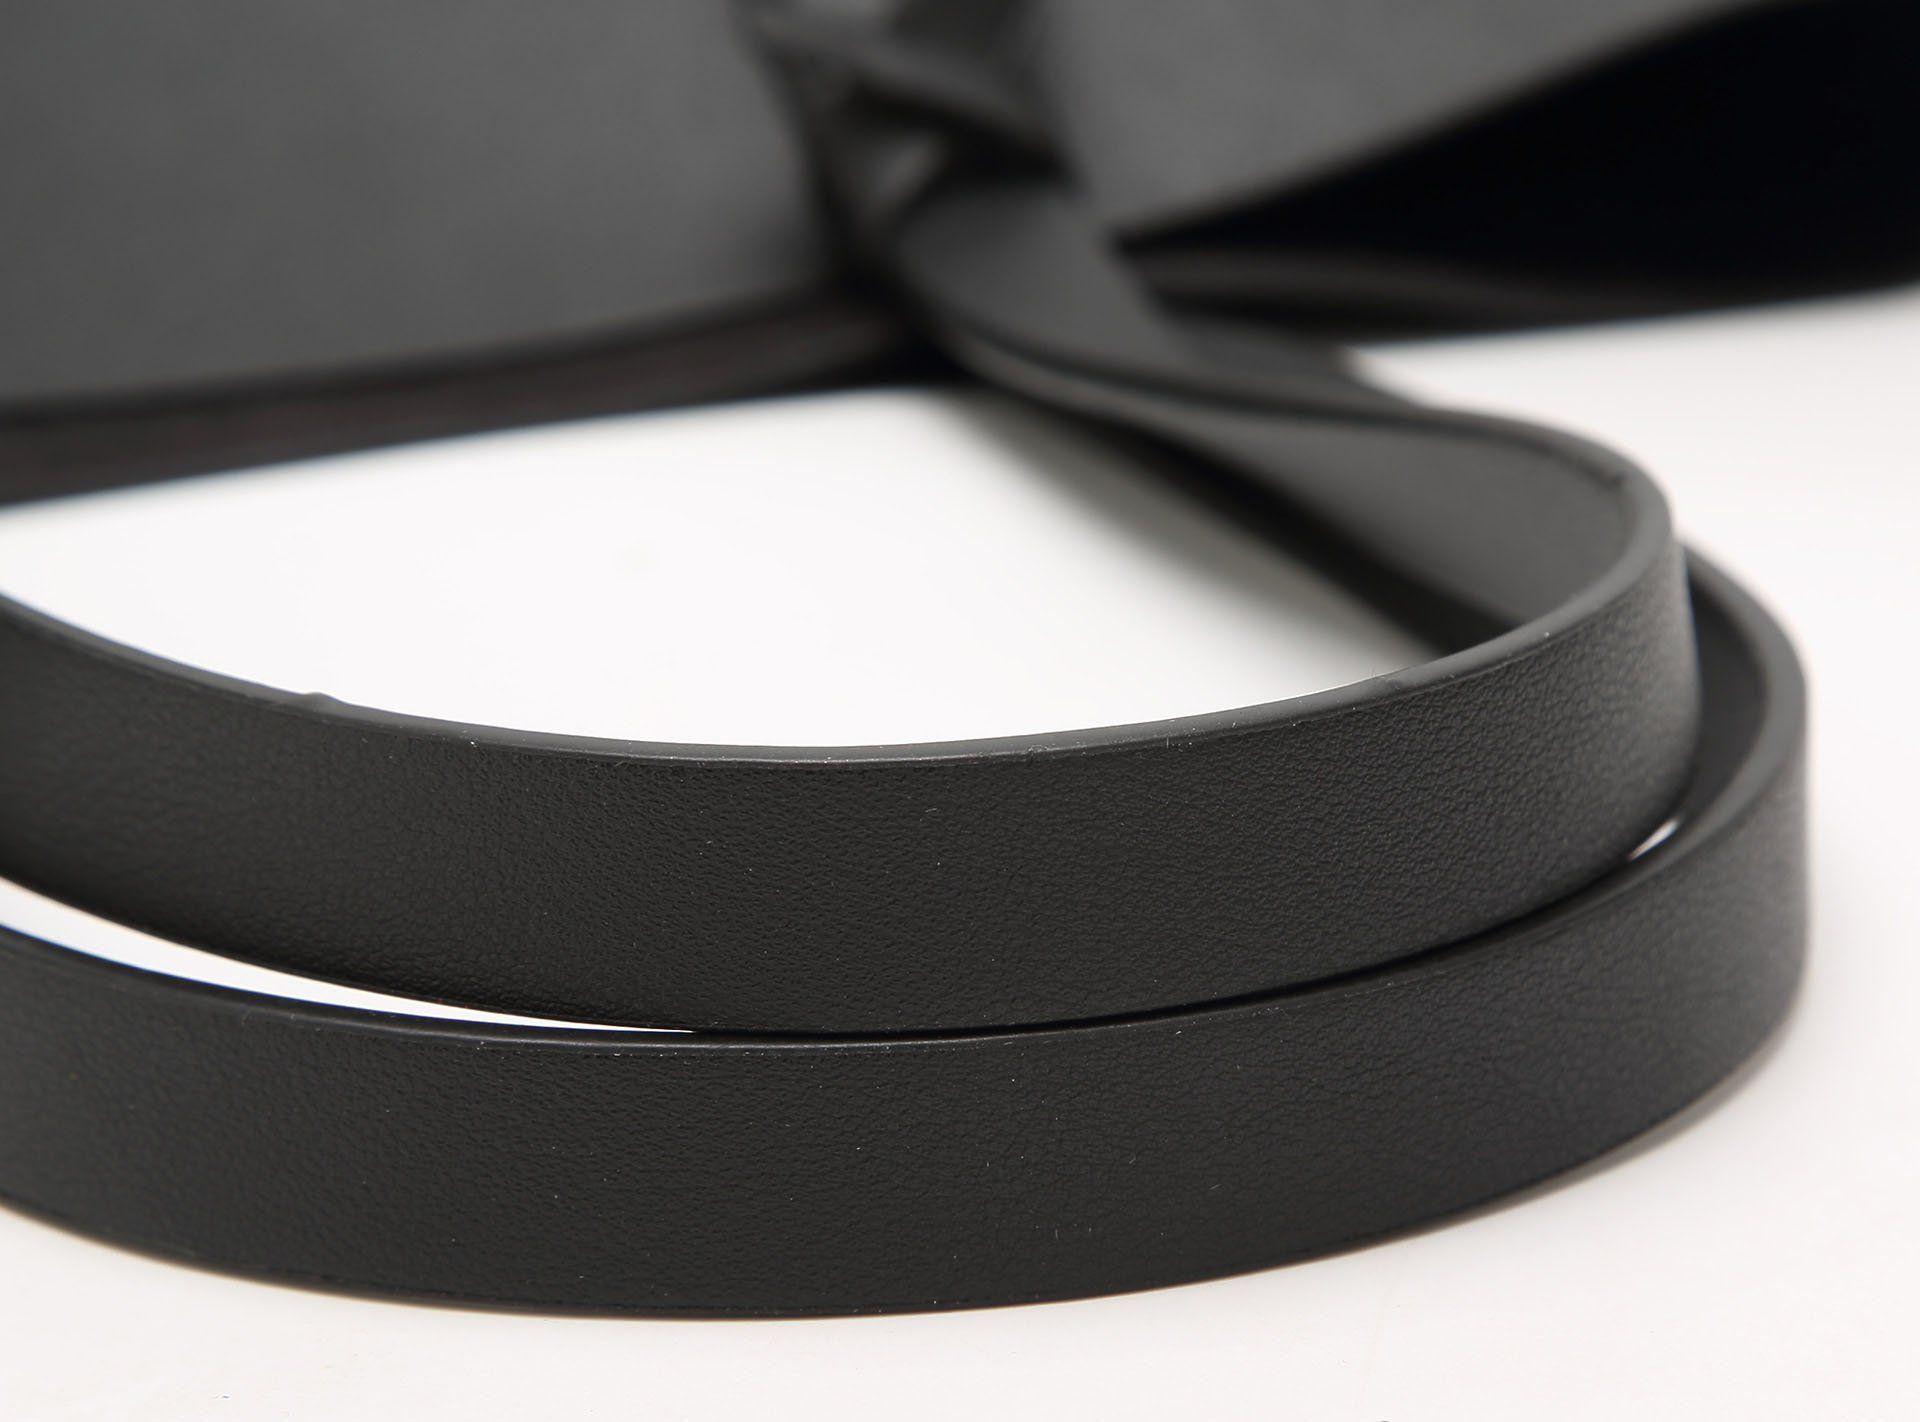 7427803ca92fe ilishop PU Leather Handbag Designer Pure Color Pures Large Capacity  Shoulder Bag Classical Tote Bags Black